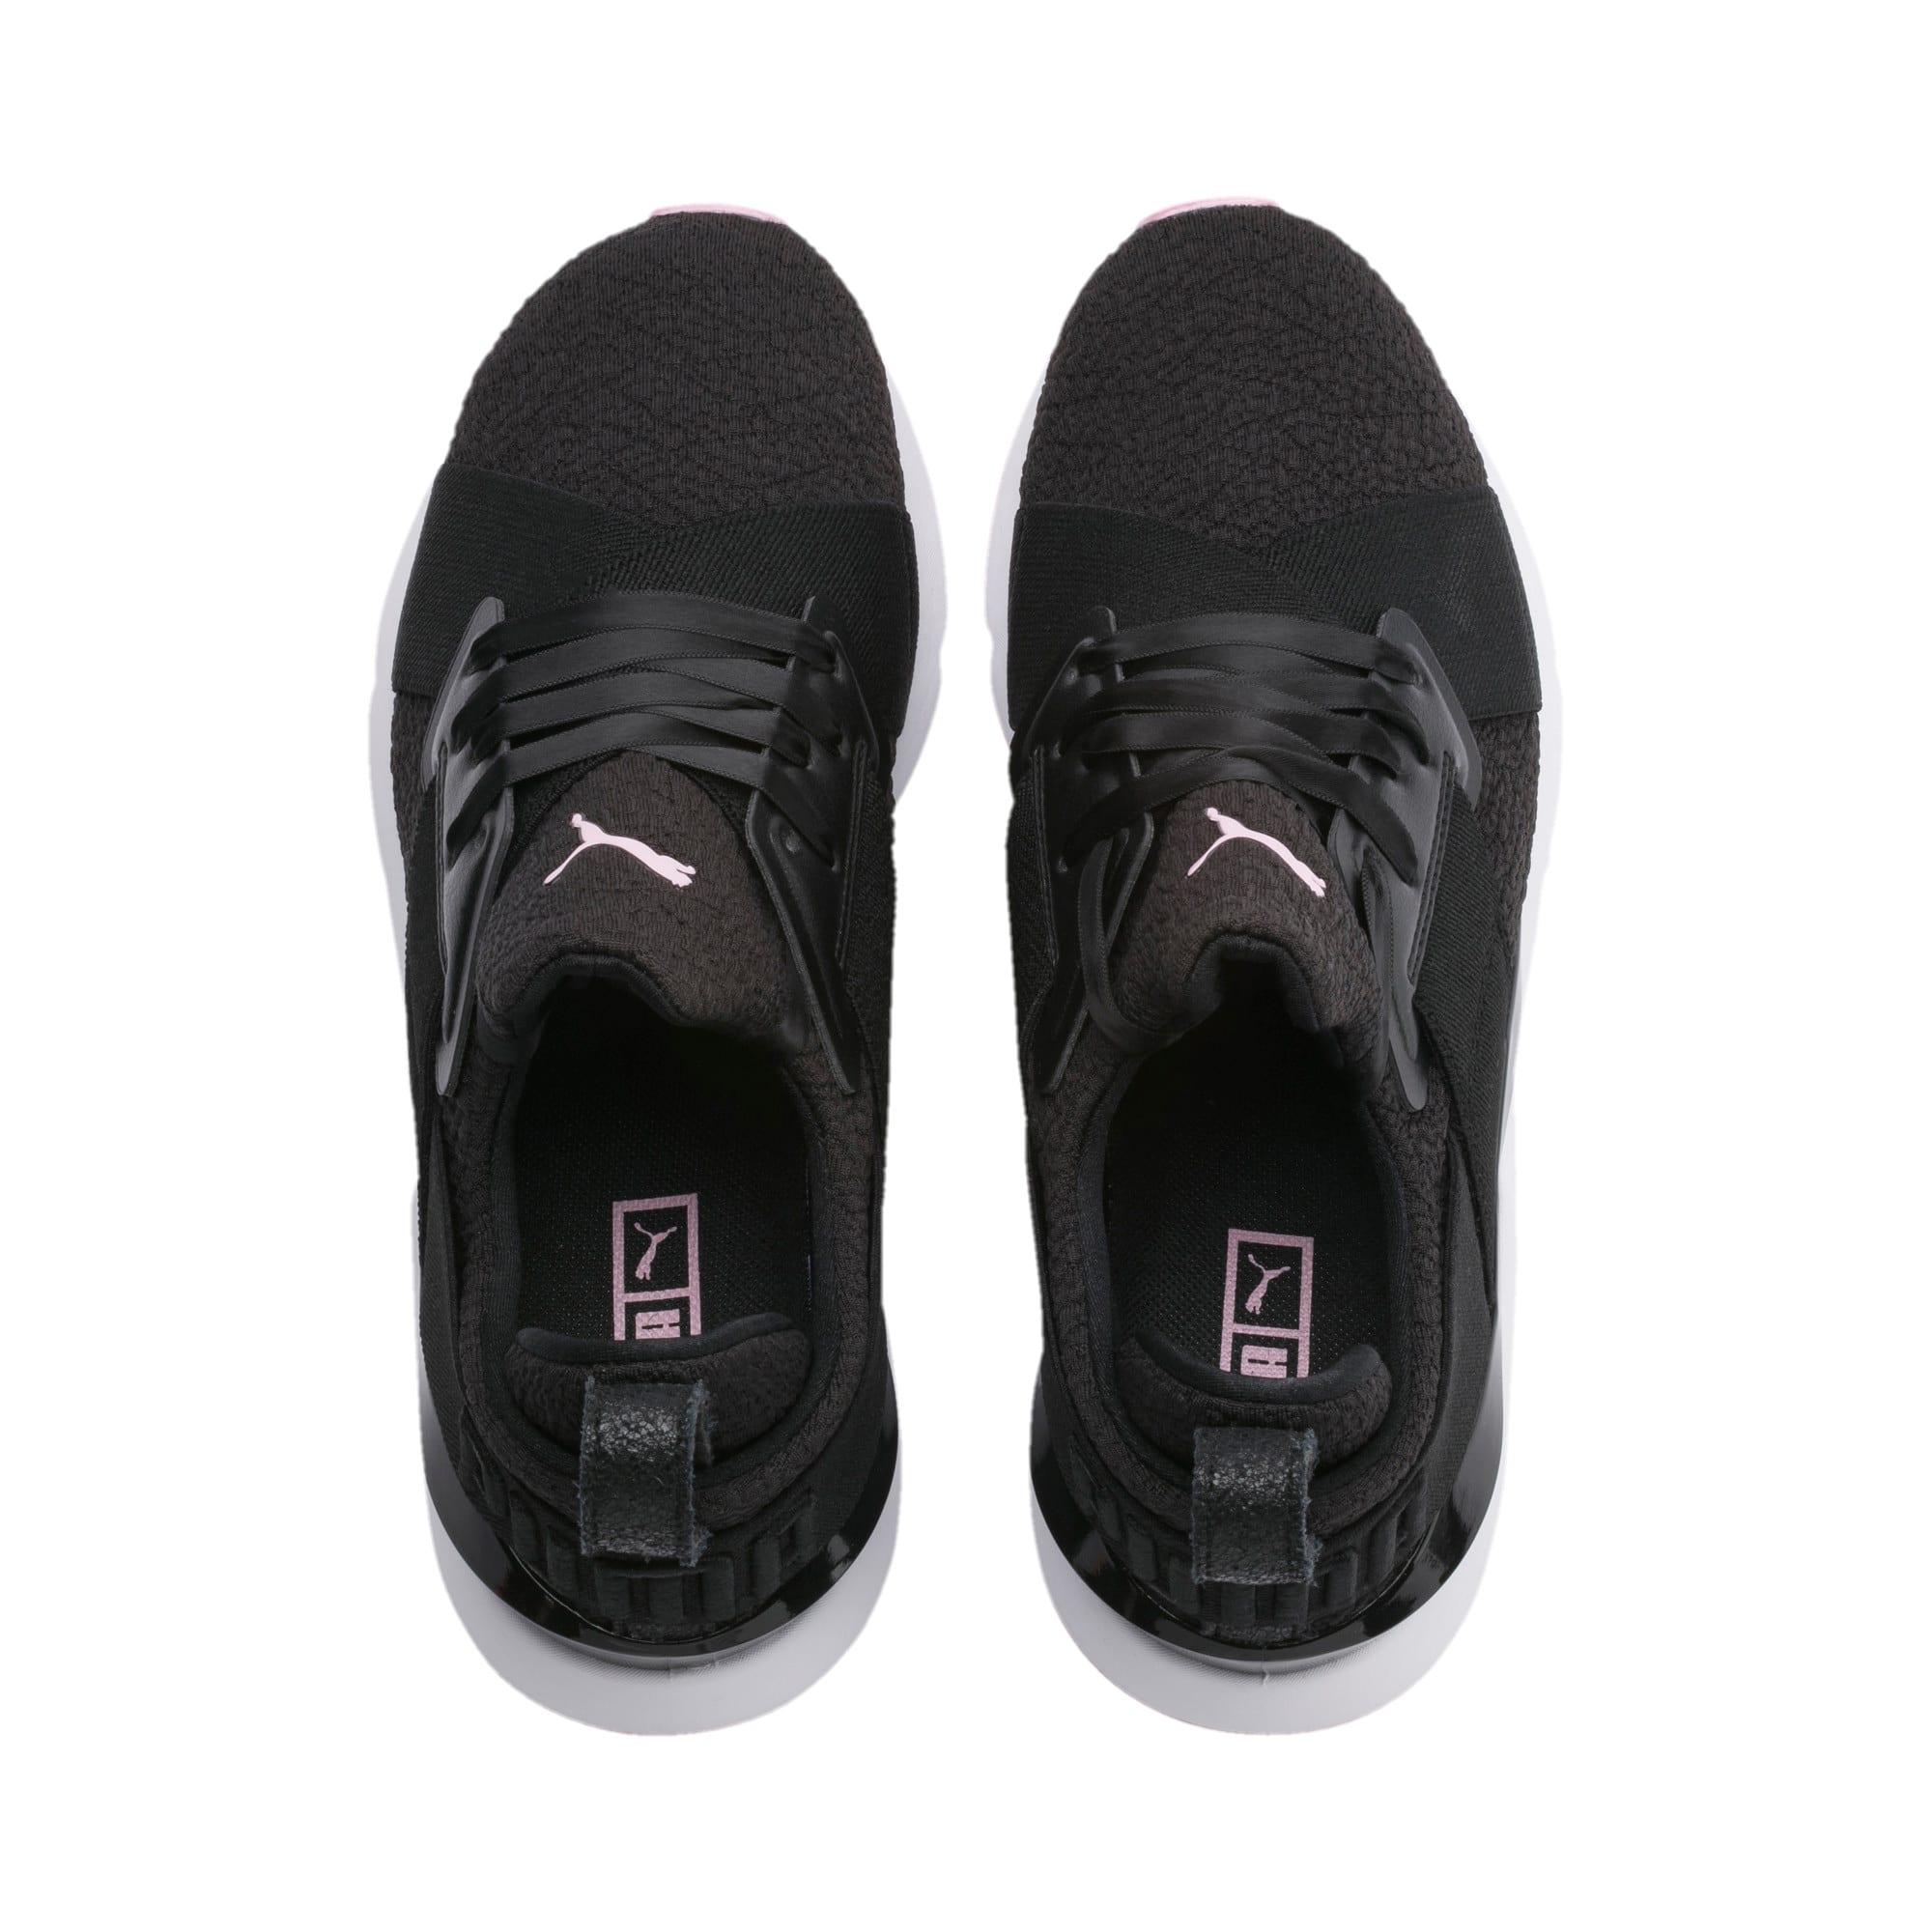 Thumbnail 6 of Muse TZ Damen Sneaker, Puma Black-Pale Pink, medium